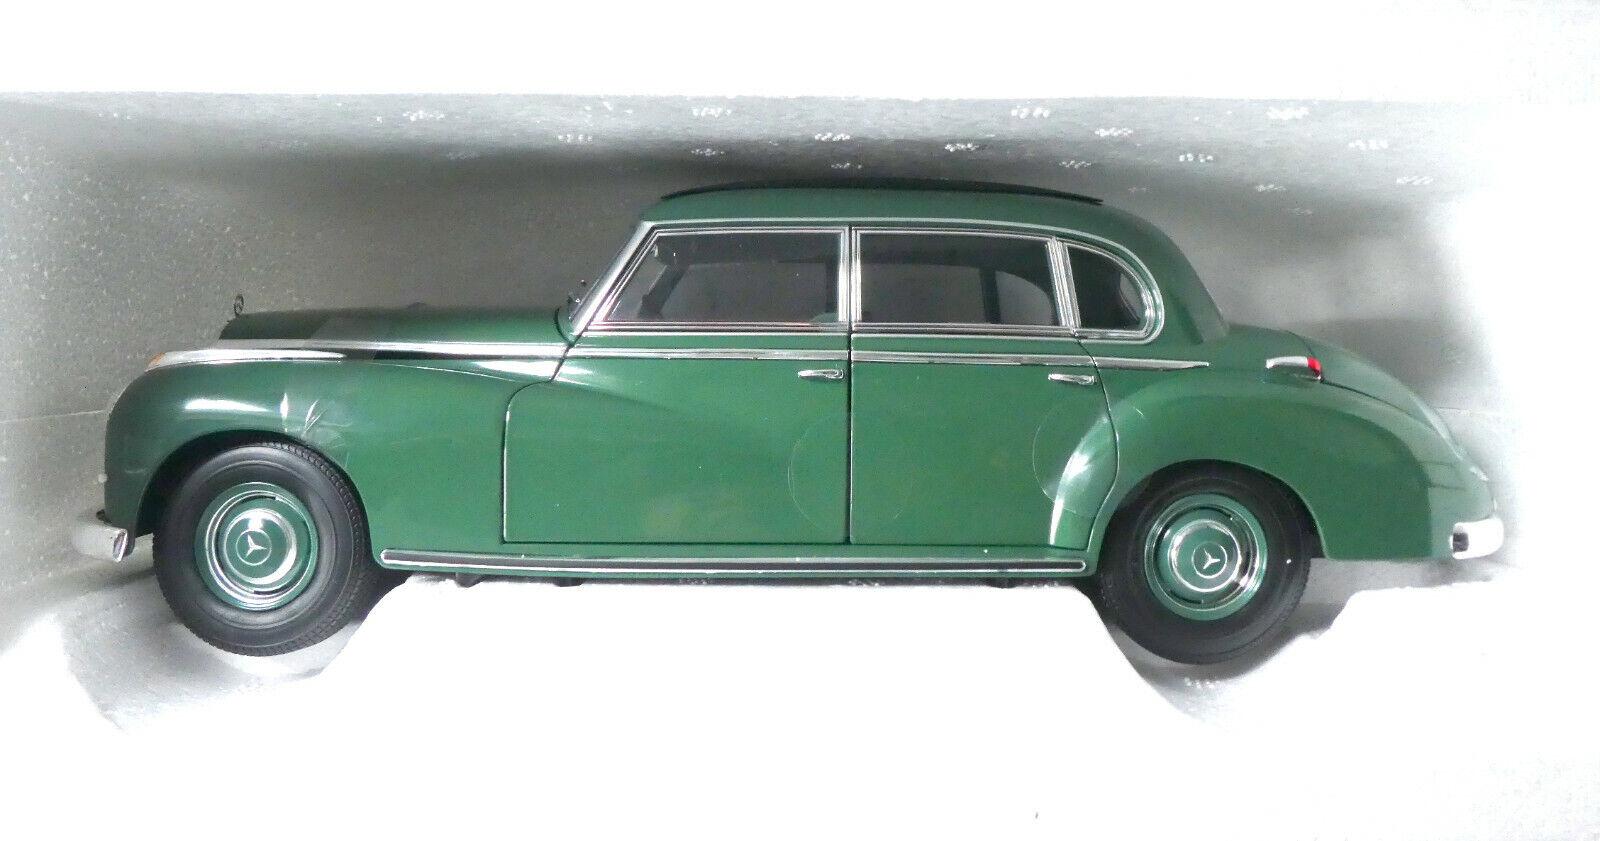 MERCEDES-BENZ 300 VERDE -1955 - 1:18 Norev NUOVO ovp#3509